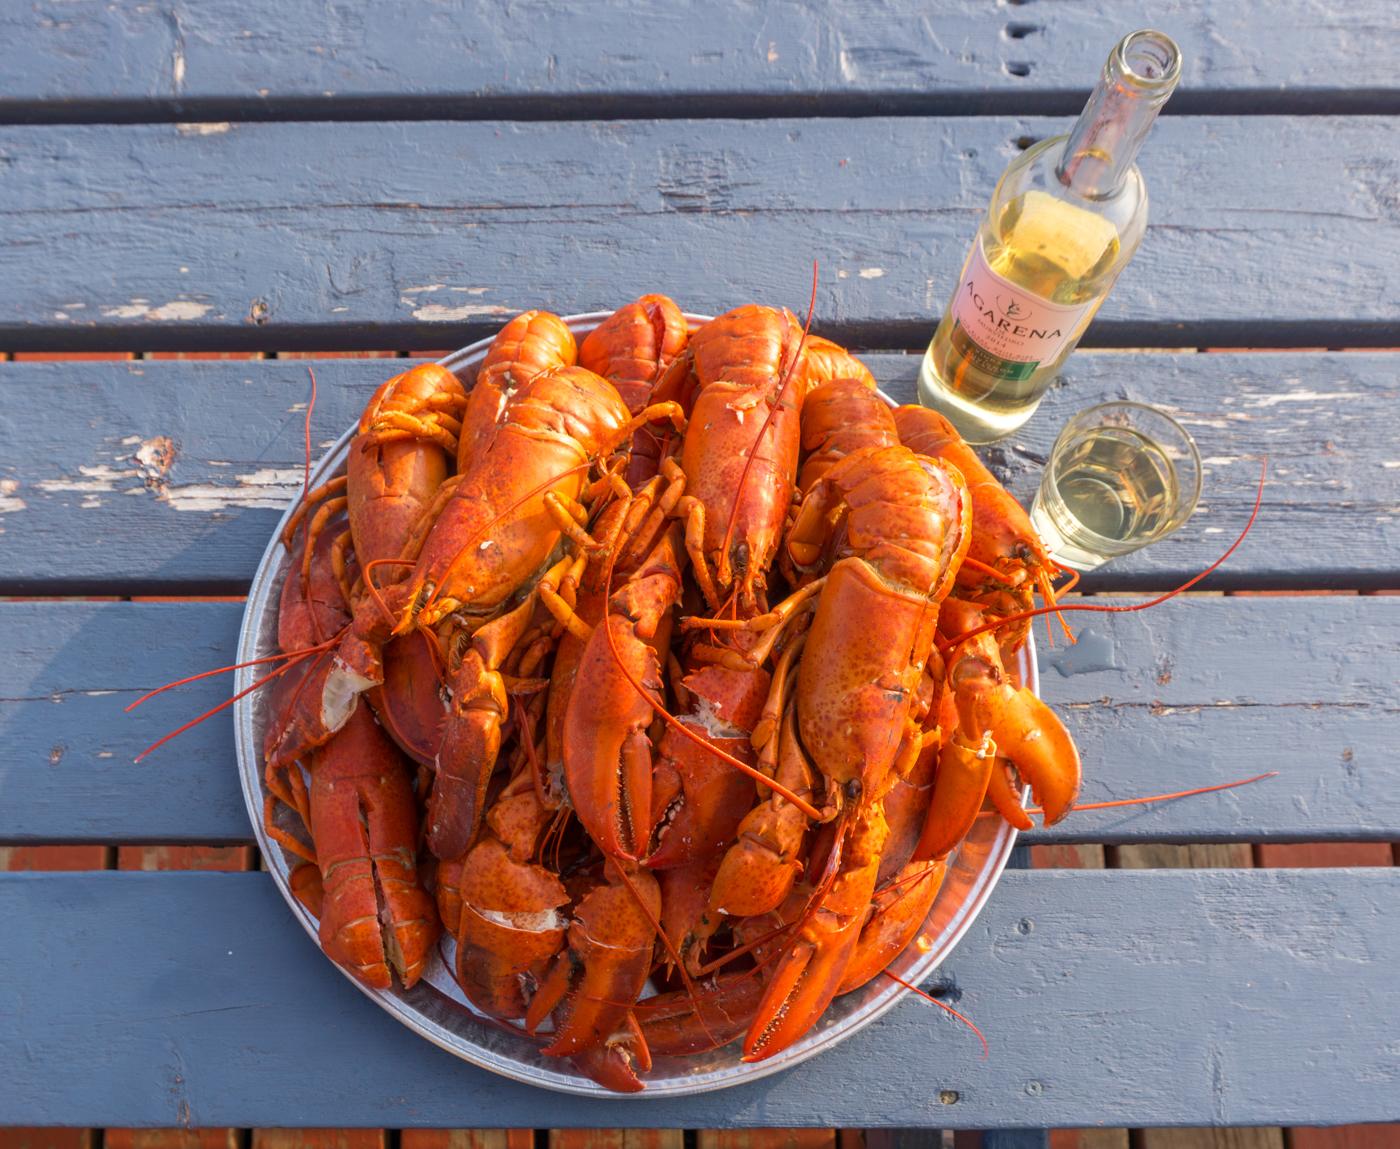 Butin de homard des îles de la Madeleine